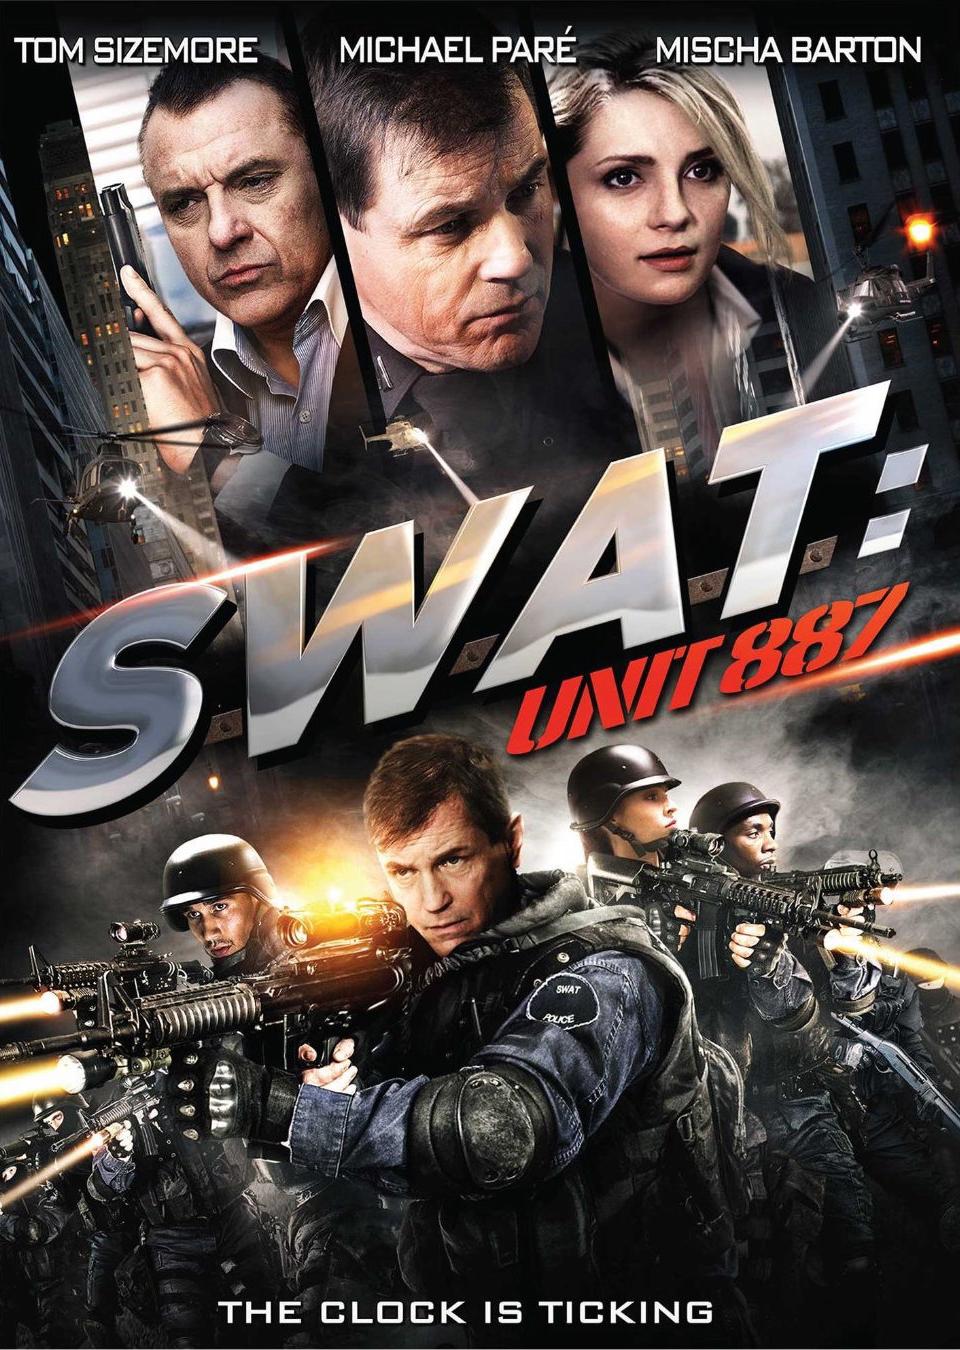 [MASTER มาใหม่] SWAT: UNIT 887 (2015) หน่วยสวาท ปฏิบัติการวันอันตราย [MASTER][เสียงไทยมาสเตอร์]